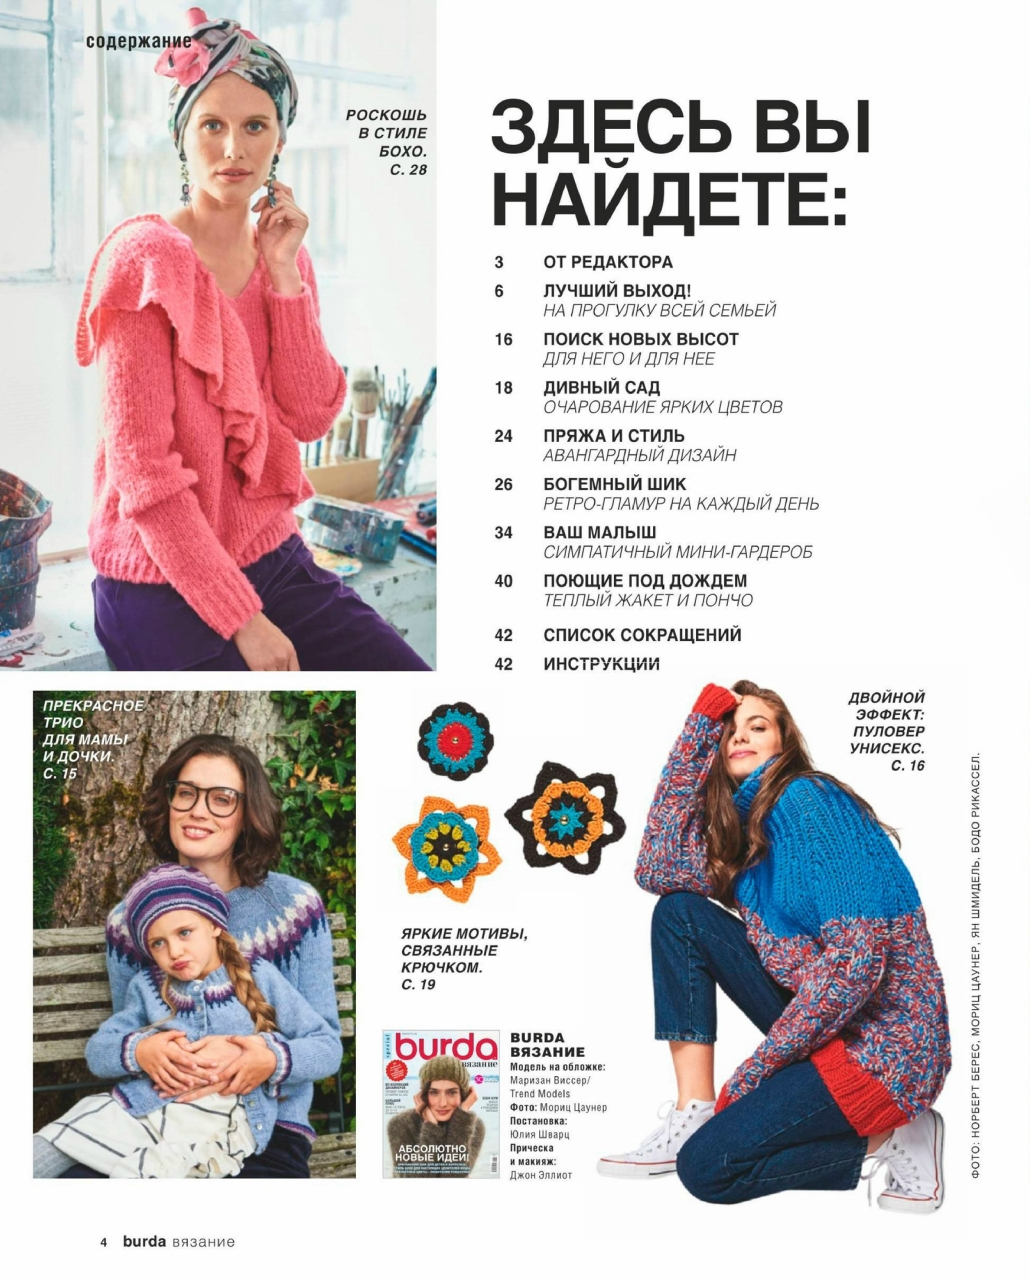 Журнал Бурда Моден декабрь 2017 анонс смотреть онлайн 96